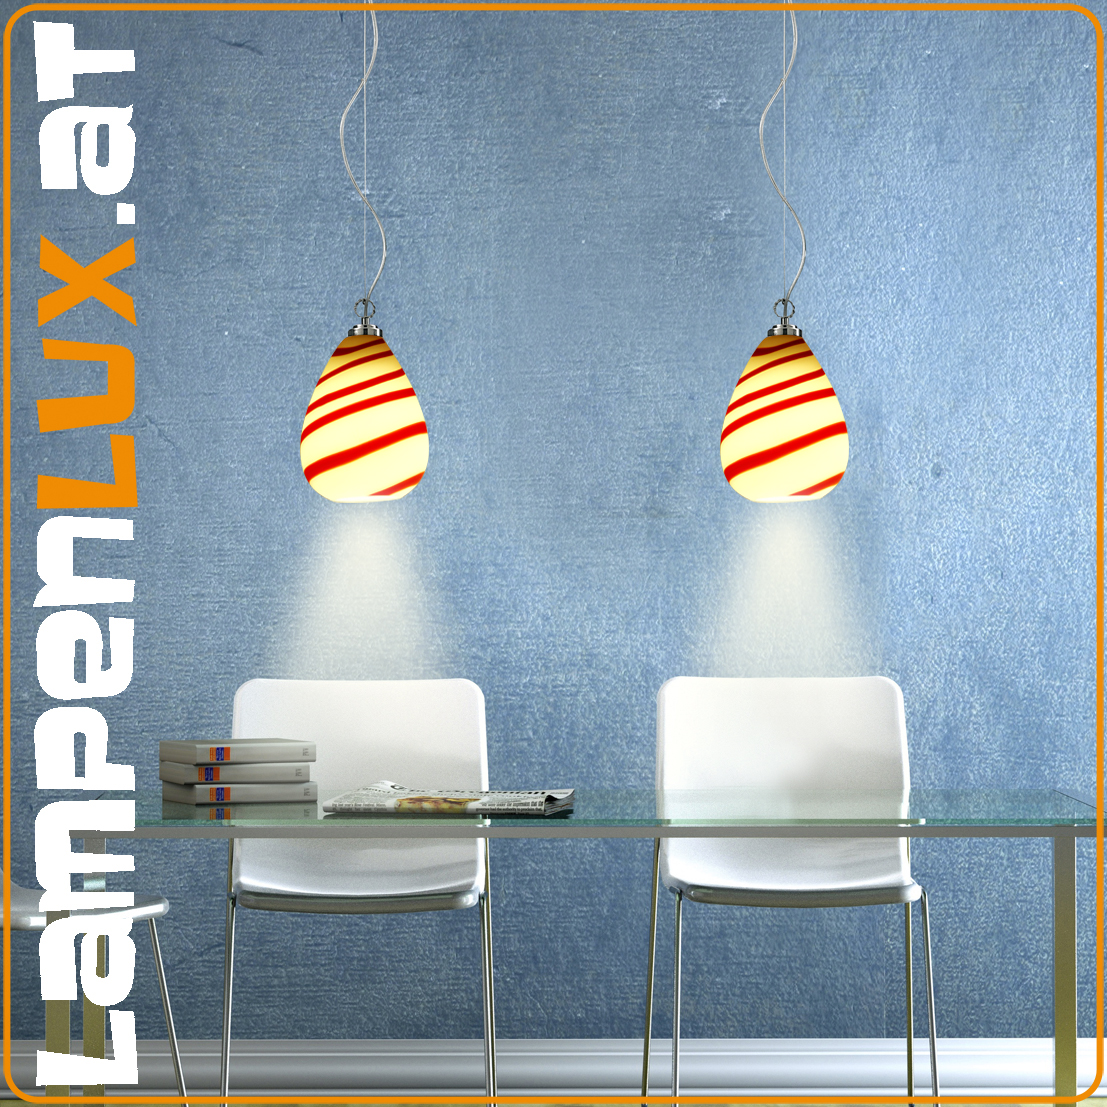 led designer lampe viele farben 60w murano glas top lampe neu ovp uvp 221 ebay. Black Bedroom Furniture Sets. Home Design Ideas